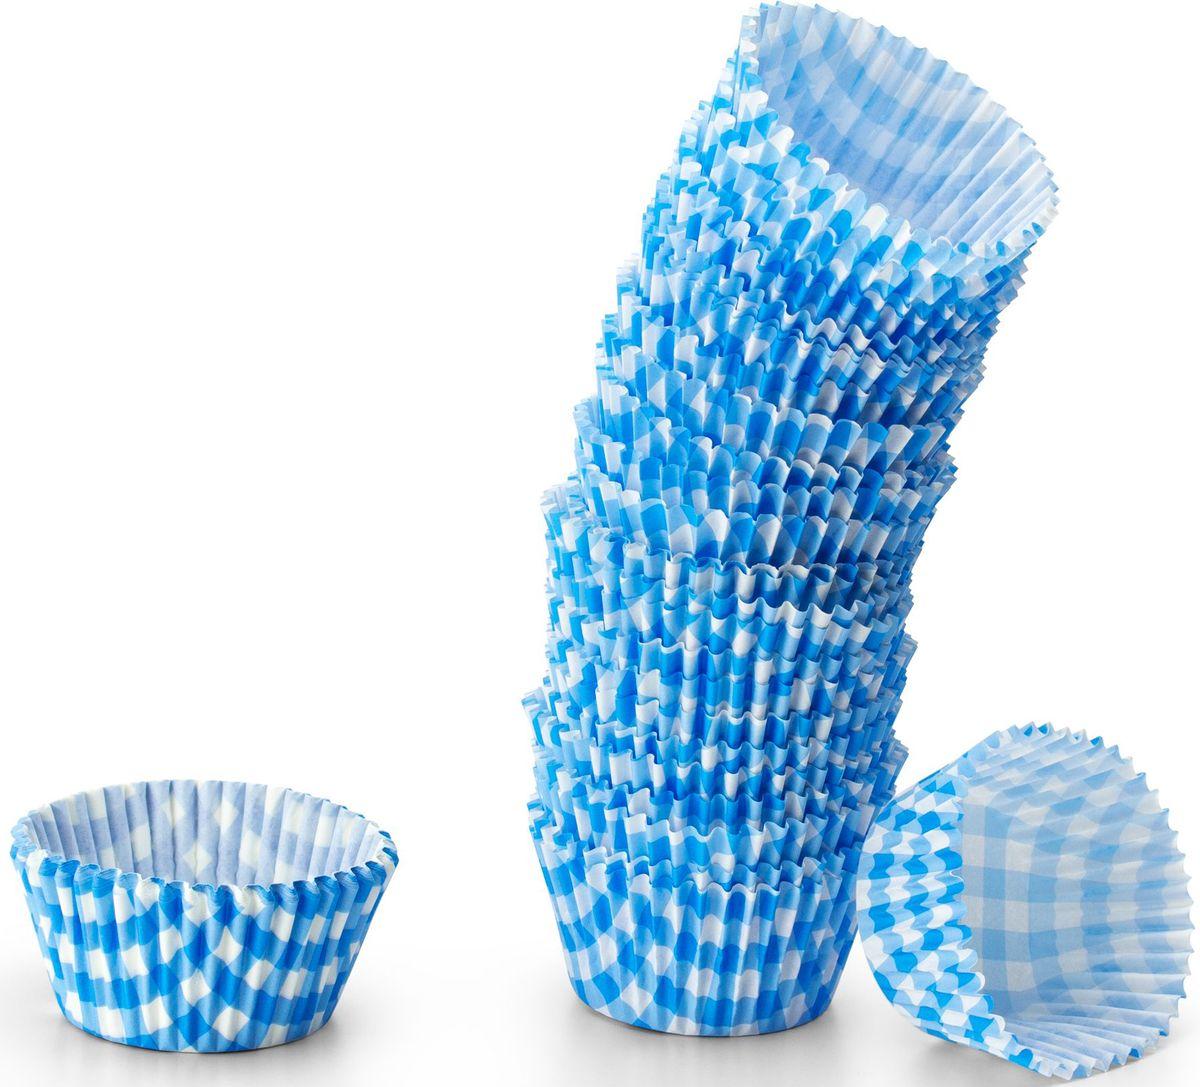 Набор форм для выпечки Menu, 5х3,5 см, 50 штVPK-05